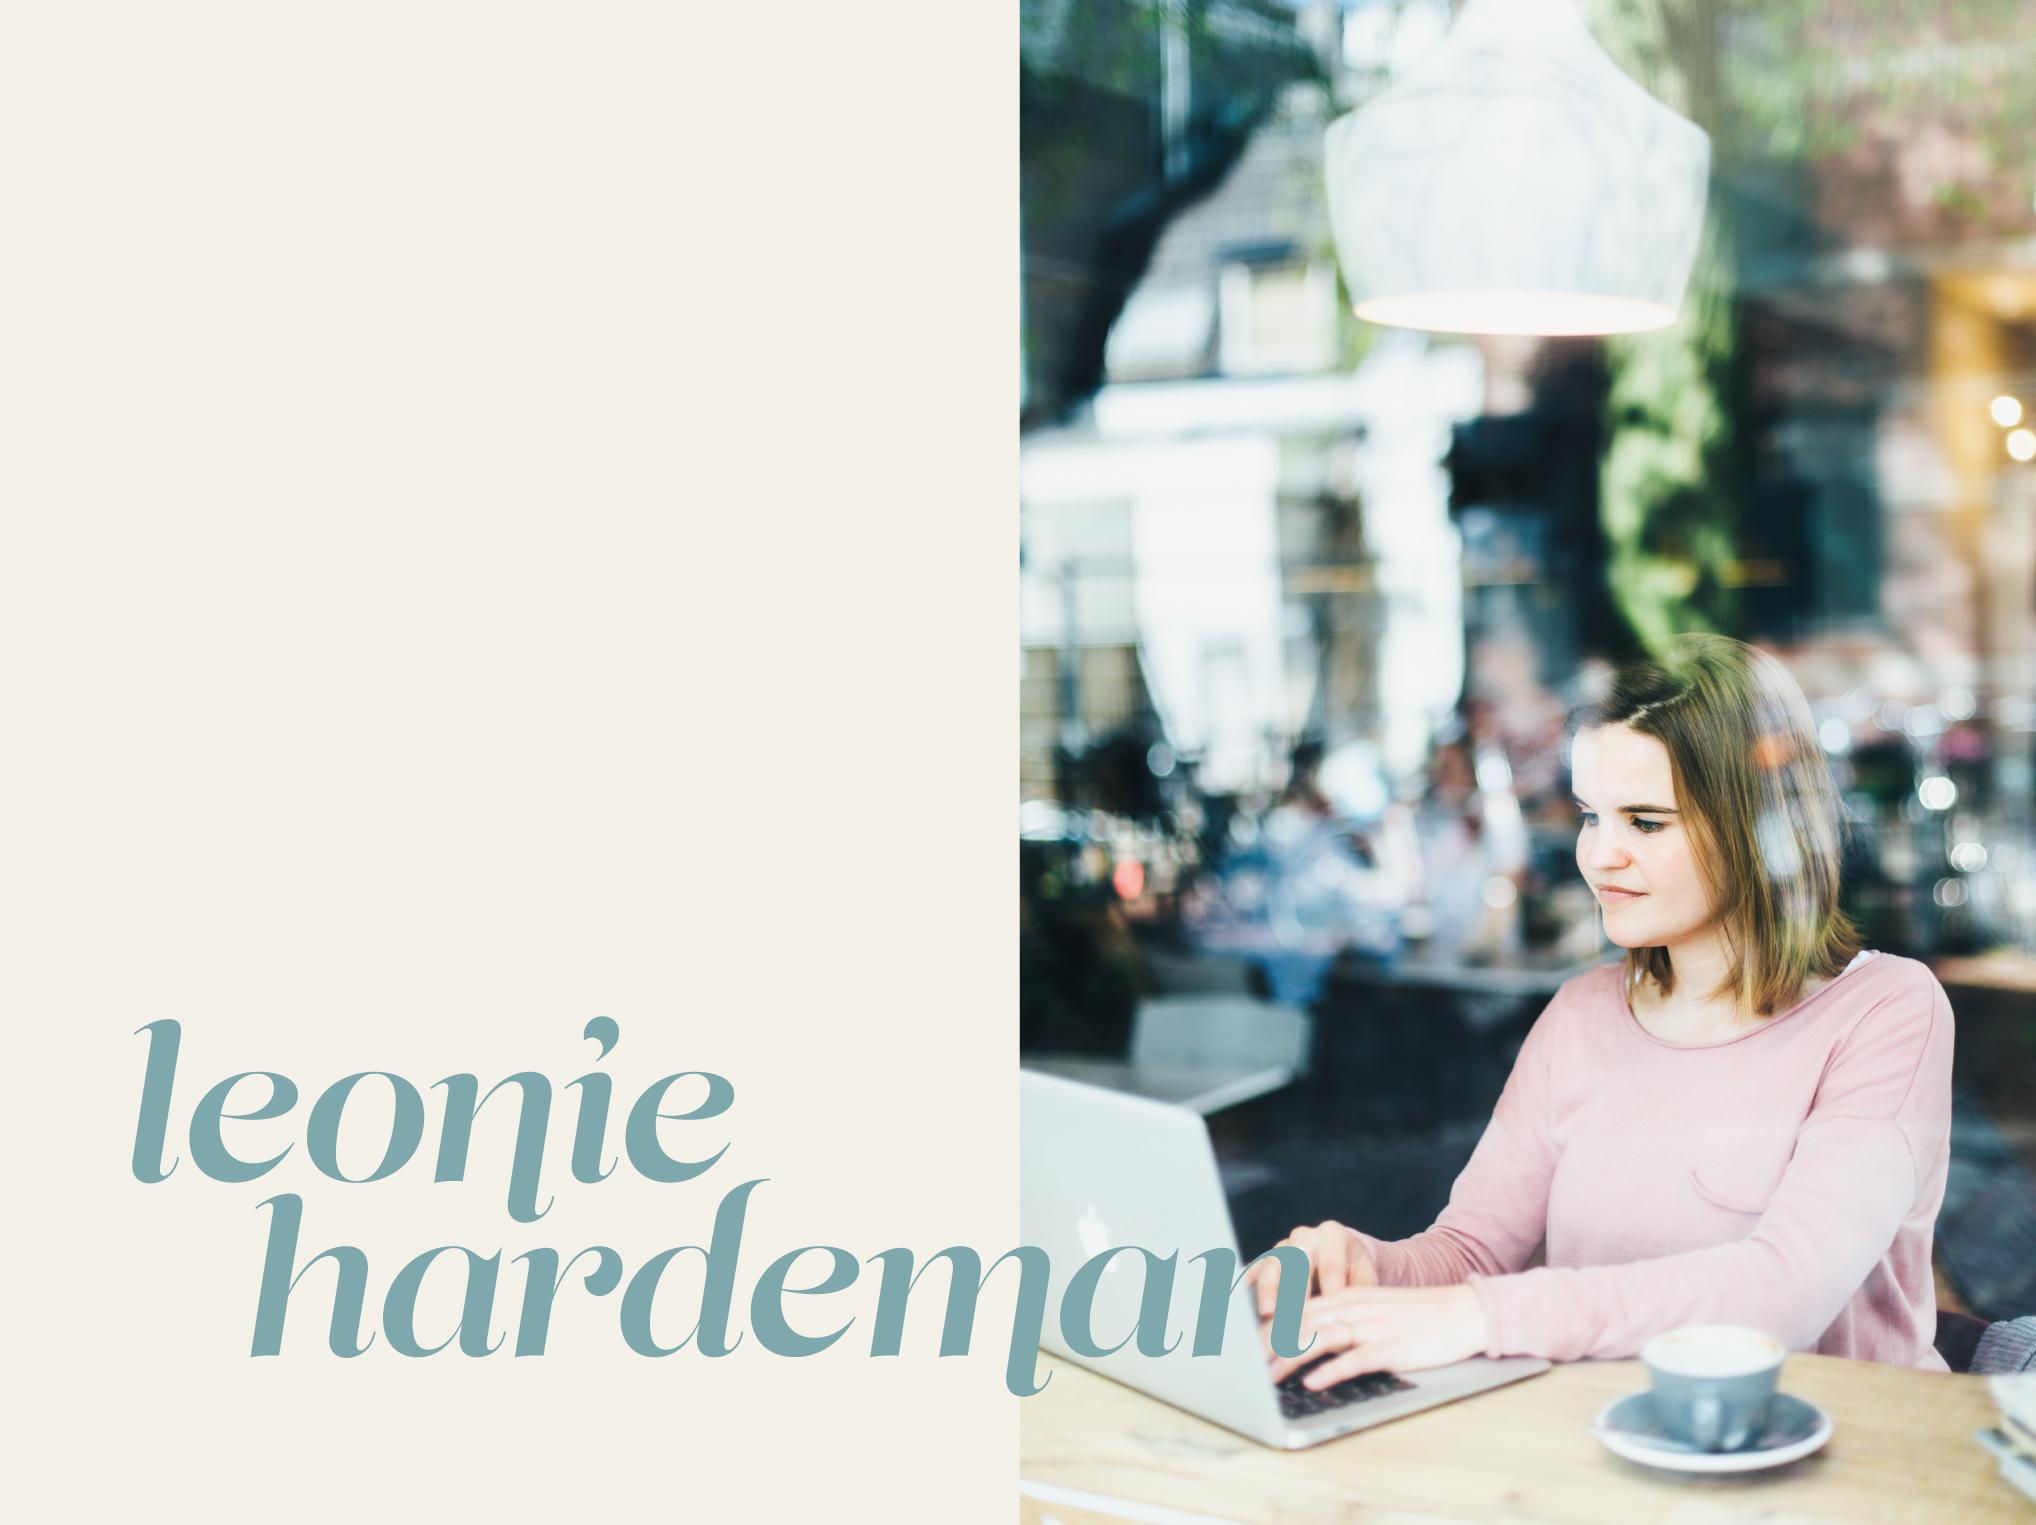 Leonie-Hardeman-logo.jpg